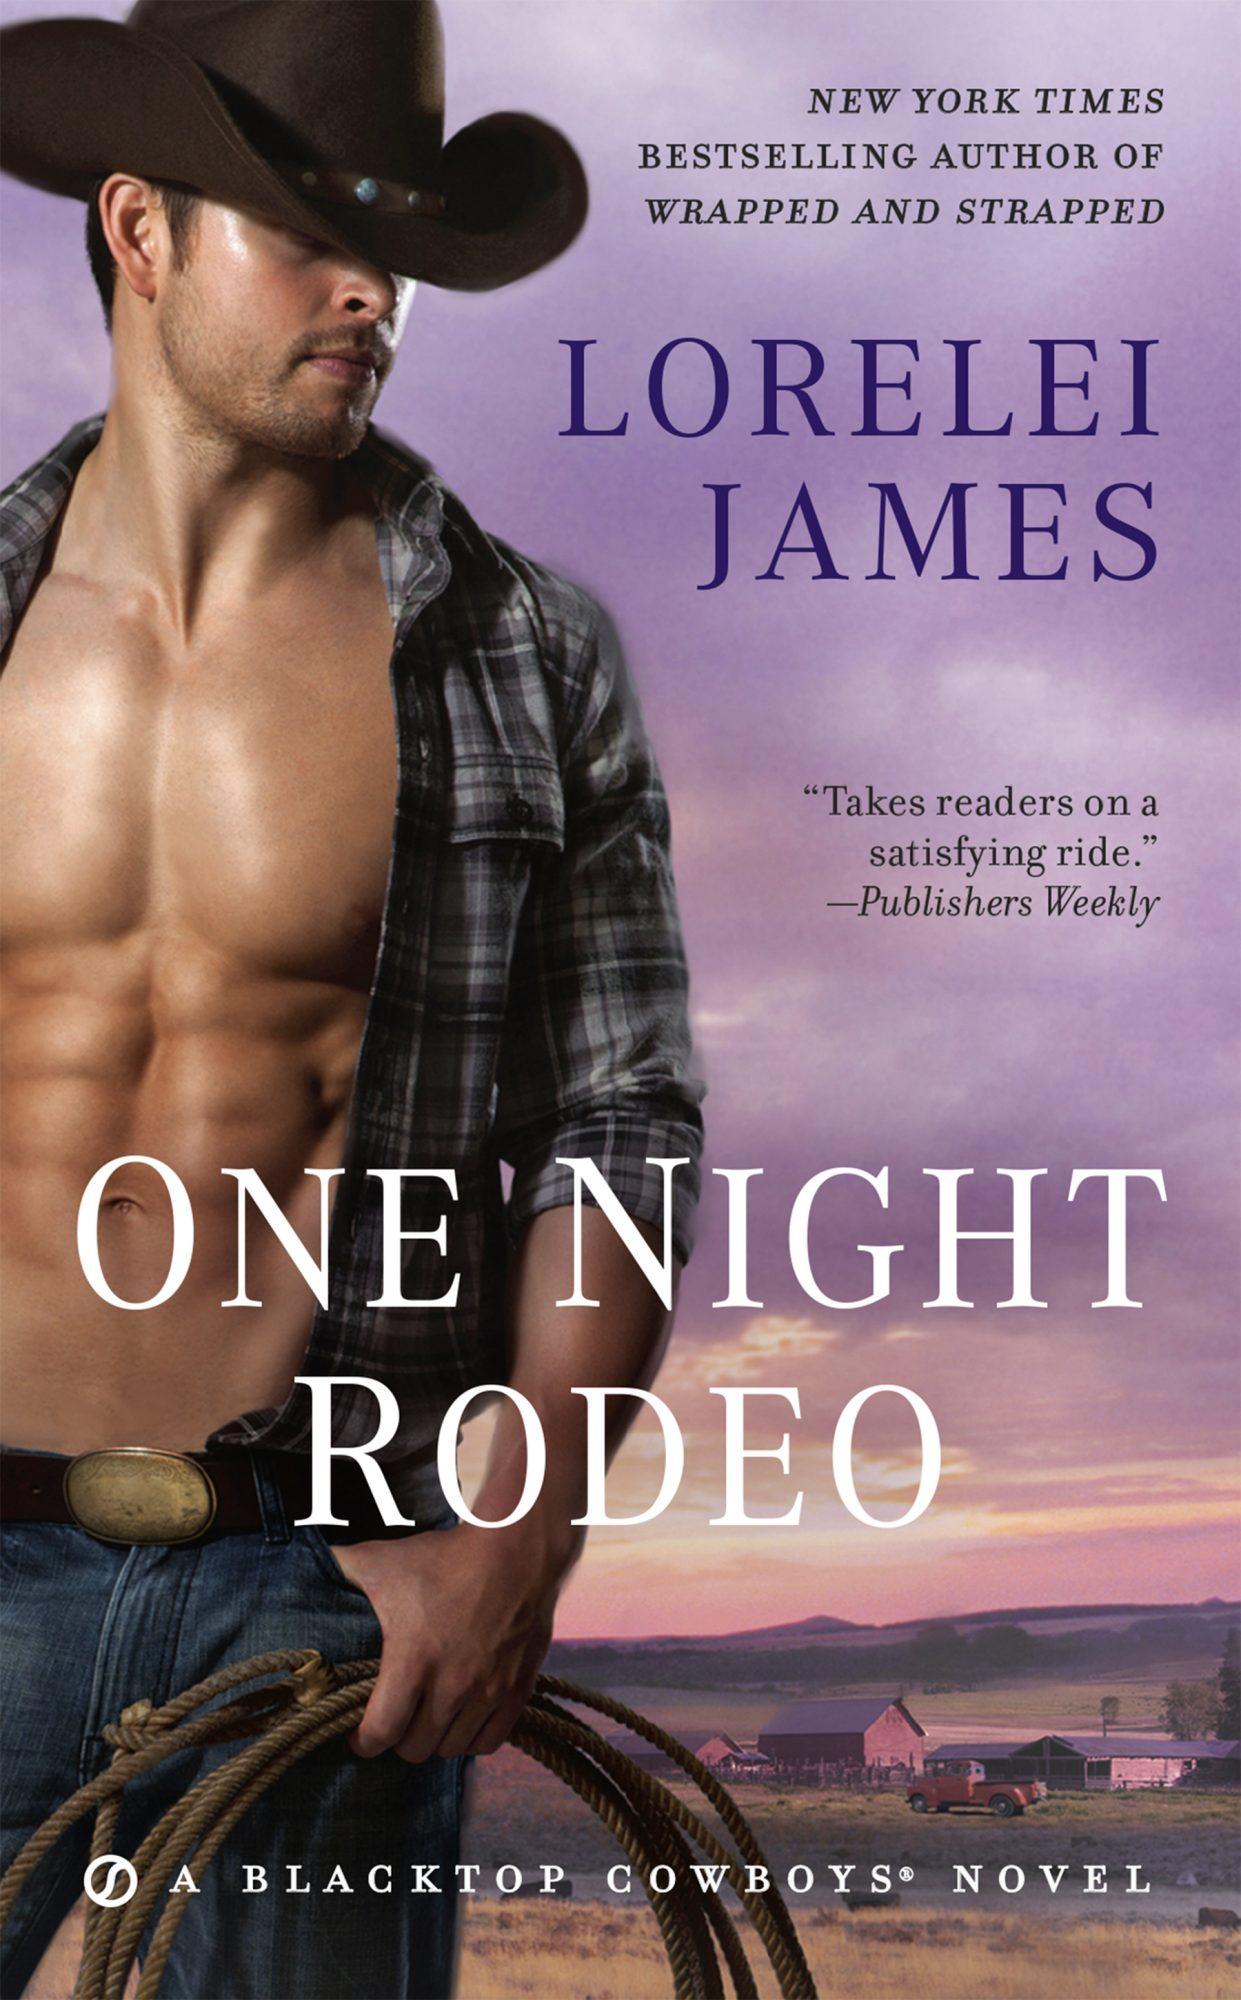 One-night-rodeo